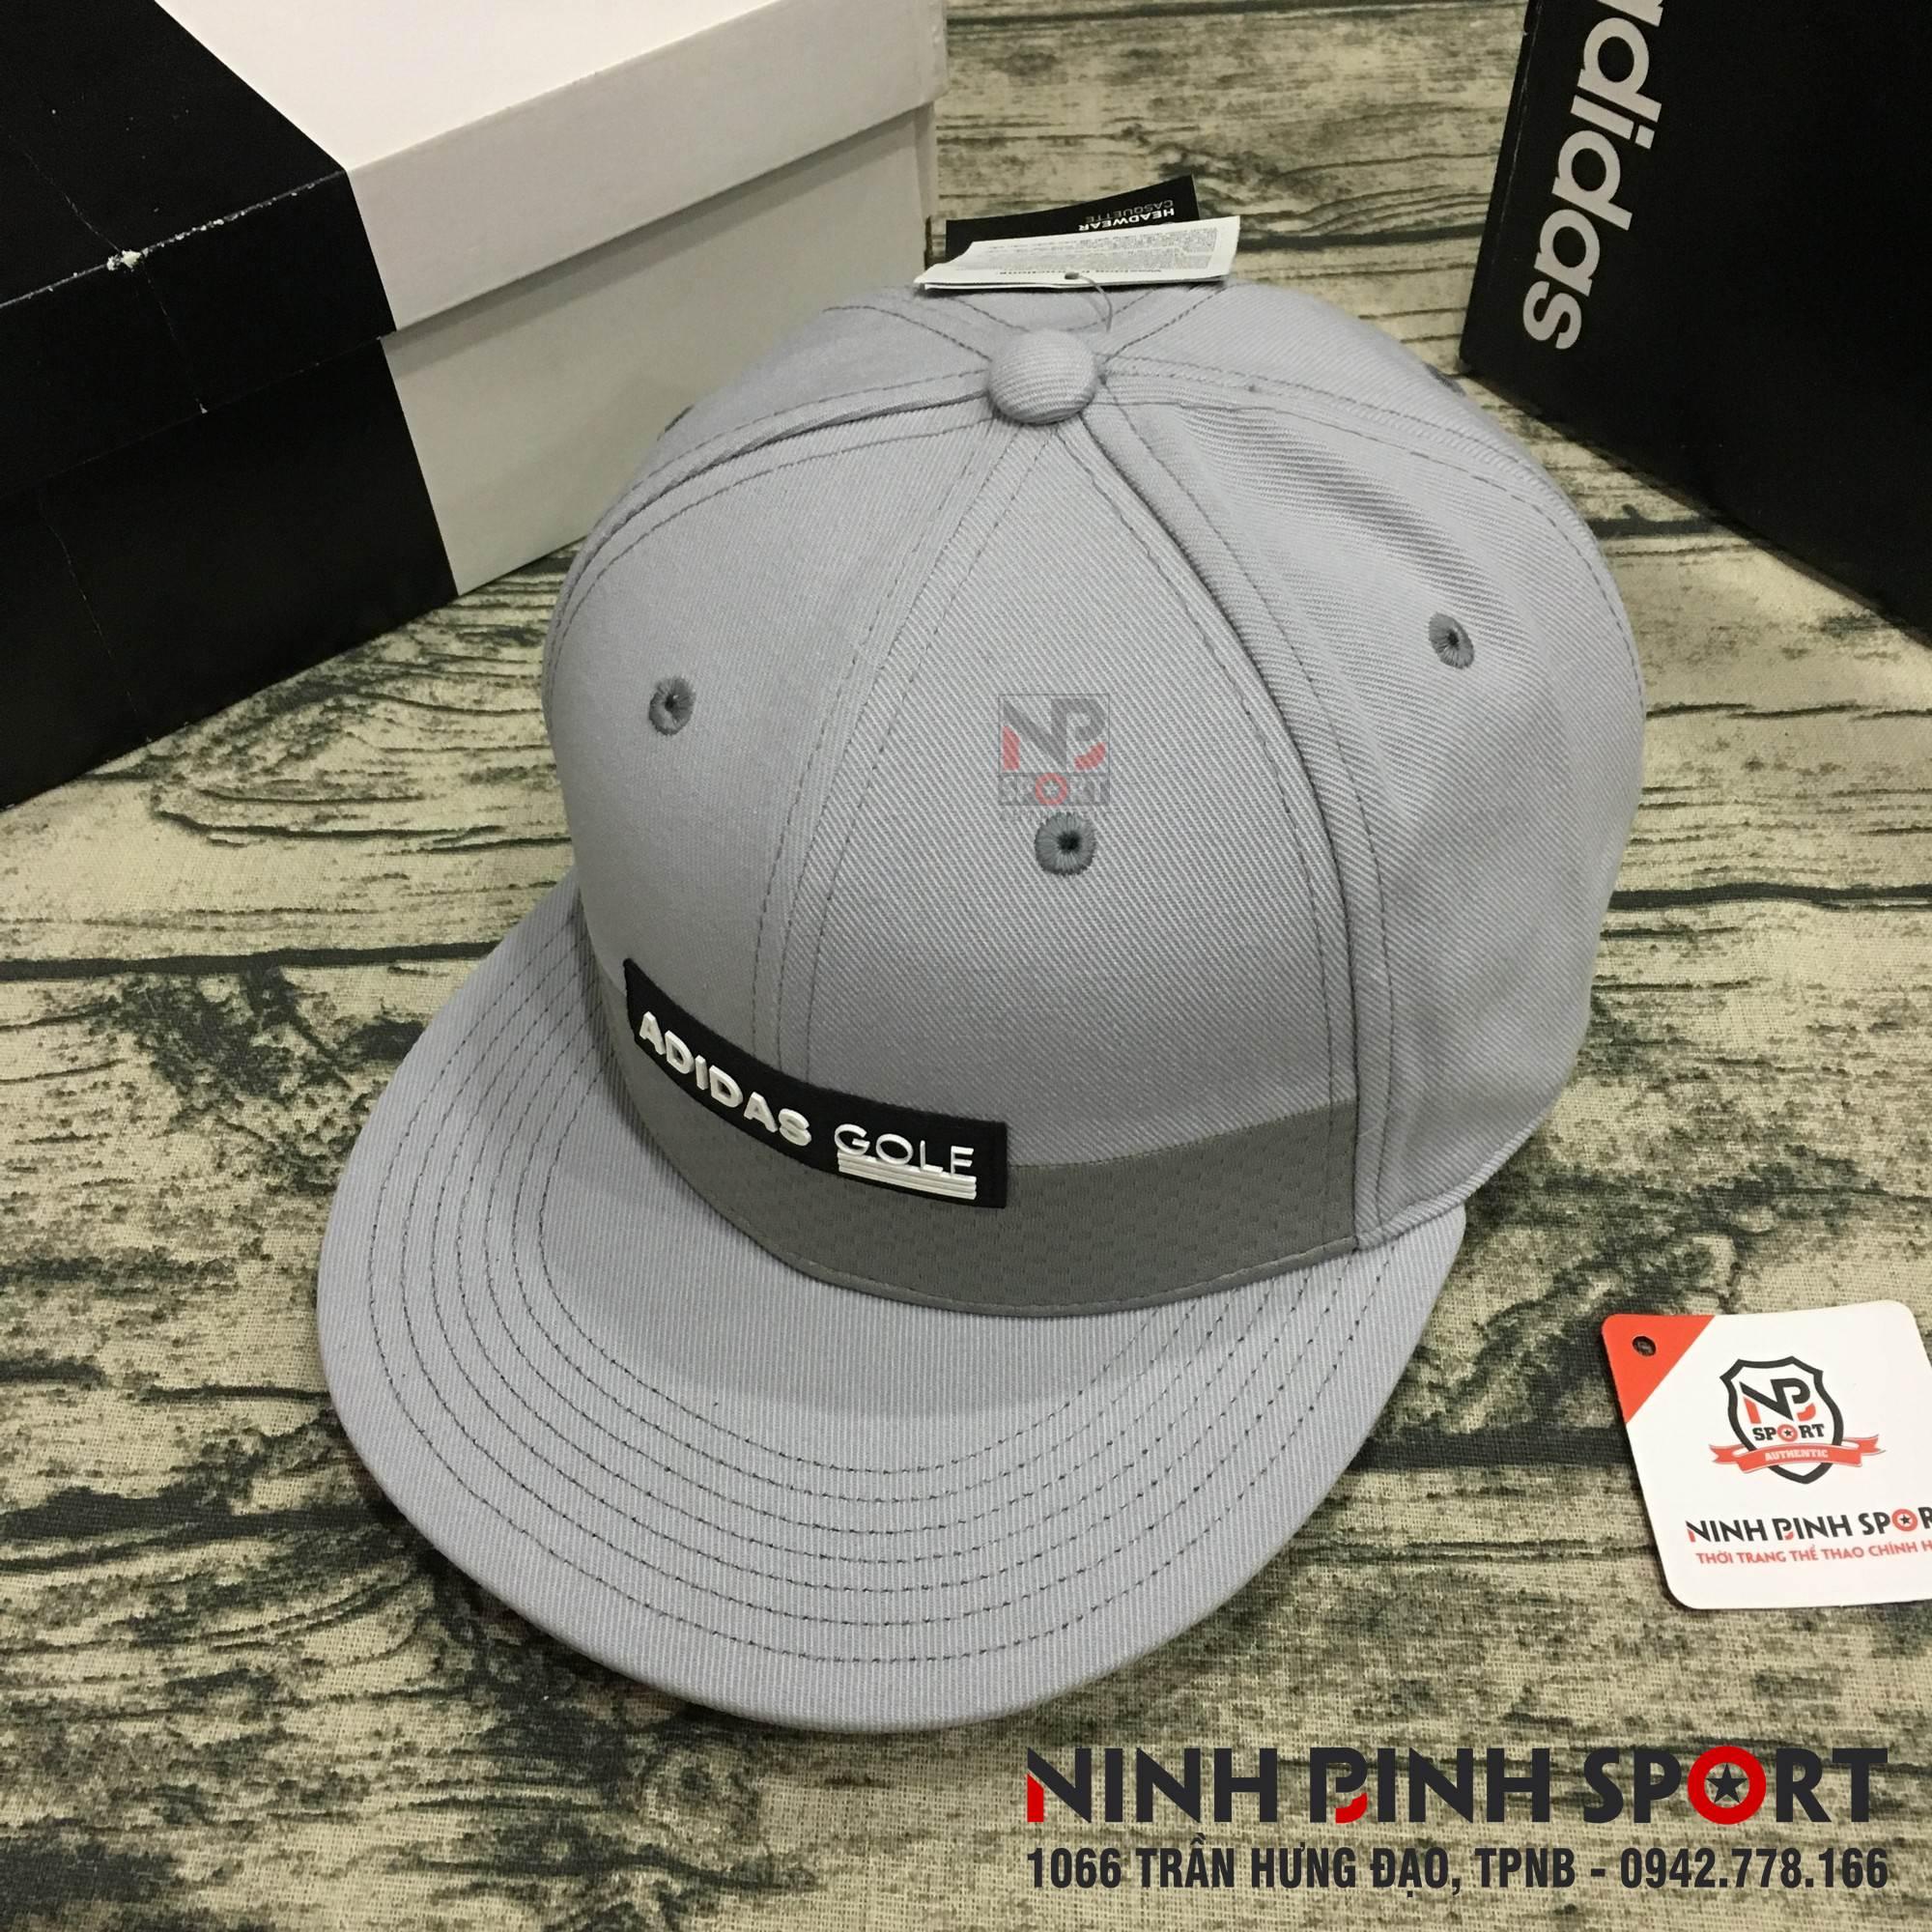 Mũ thể thao Adidas Golf Tonal Block Flat-Brim Cap Grey CY9772